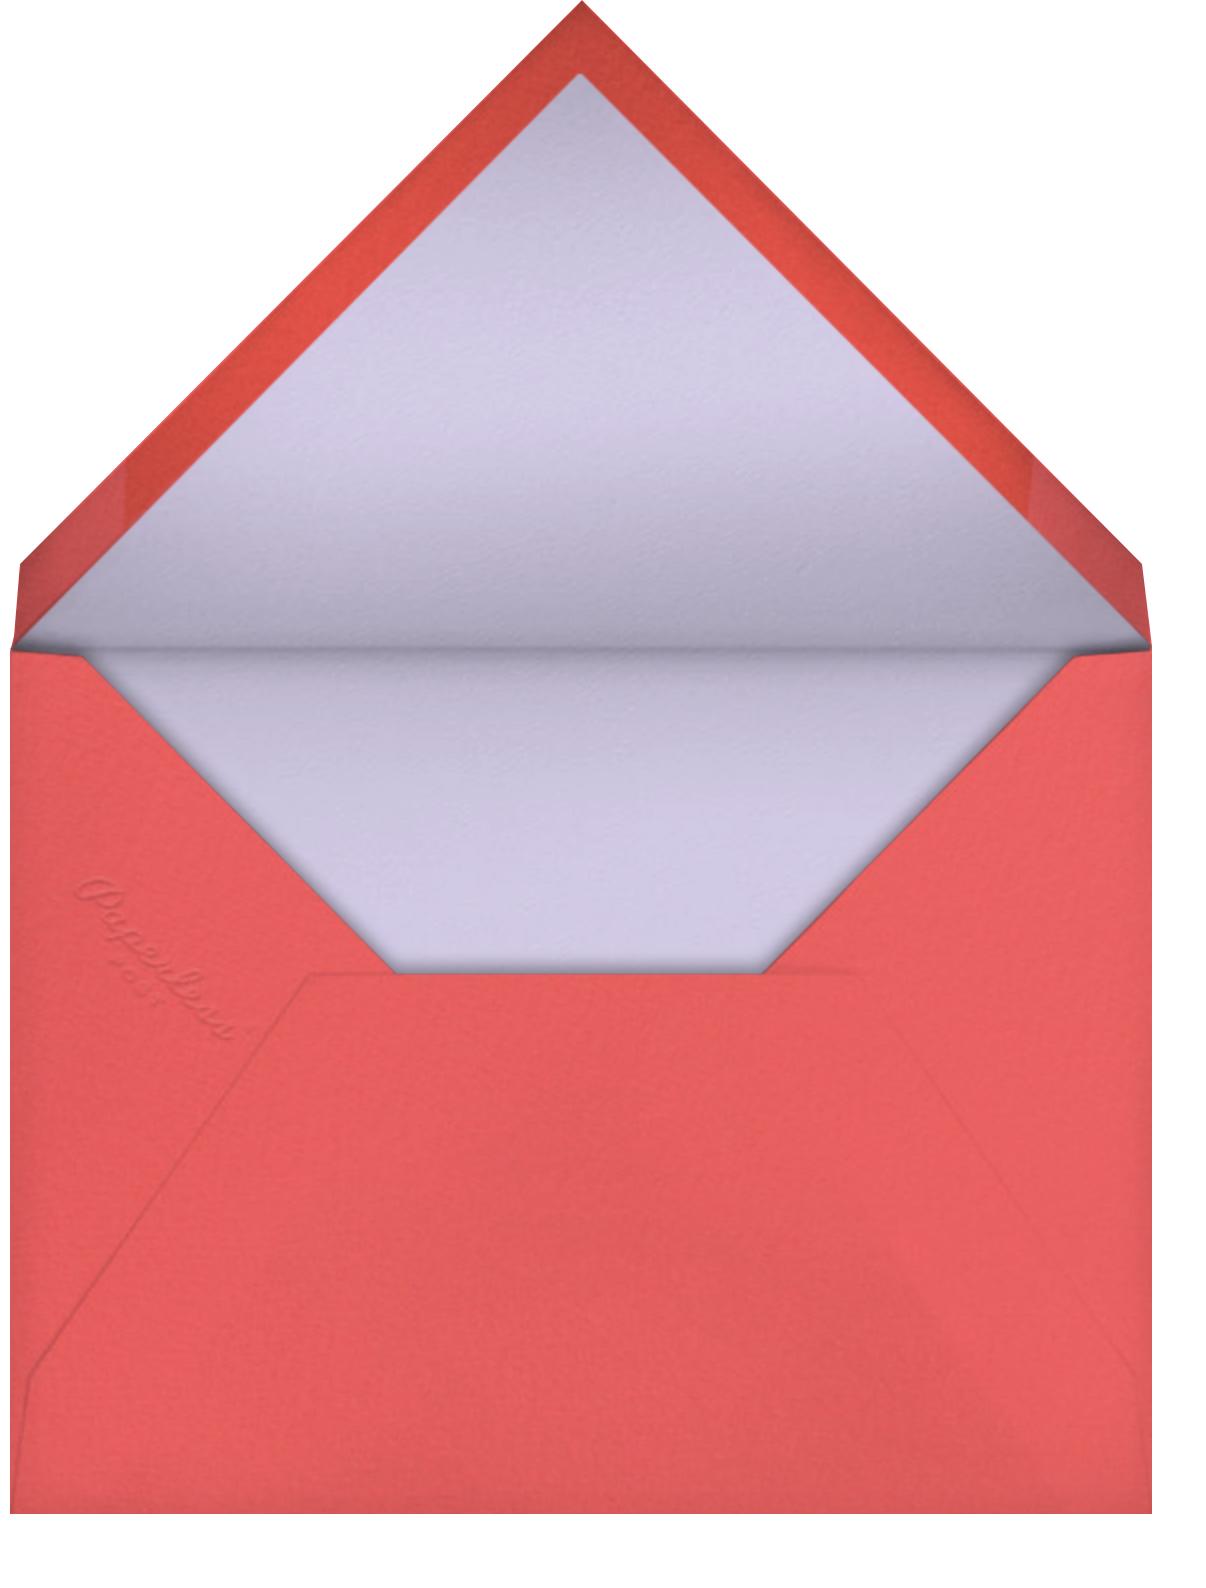 Heaven Sent - Mother's Day - Hello!Lucky - Envelope